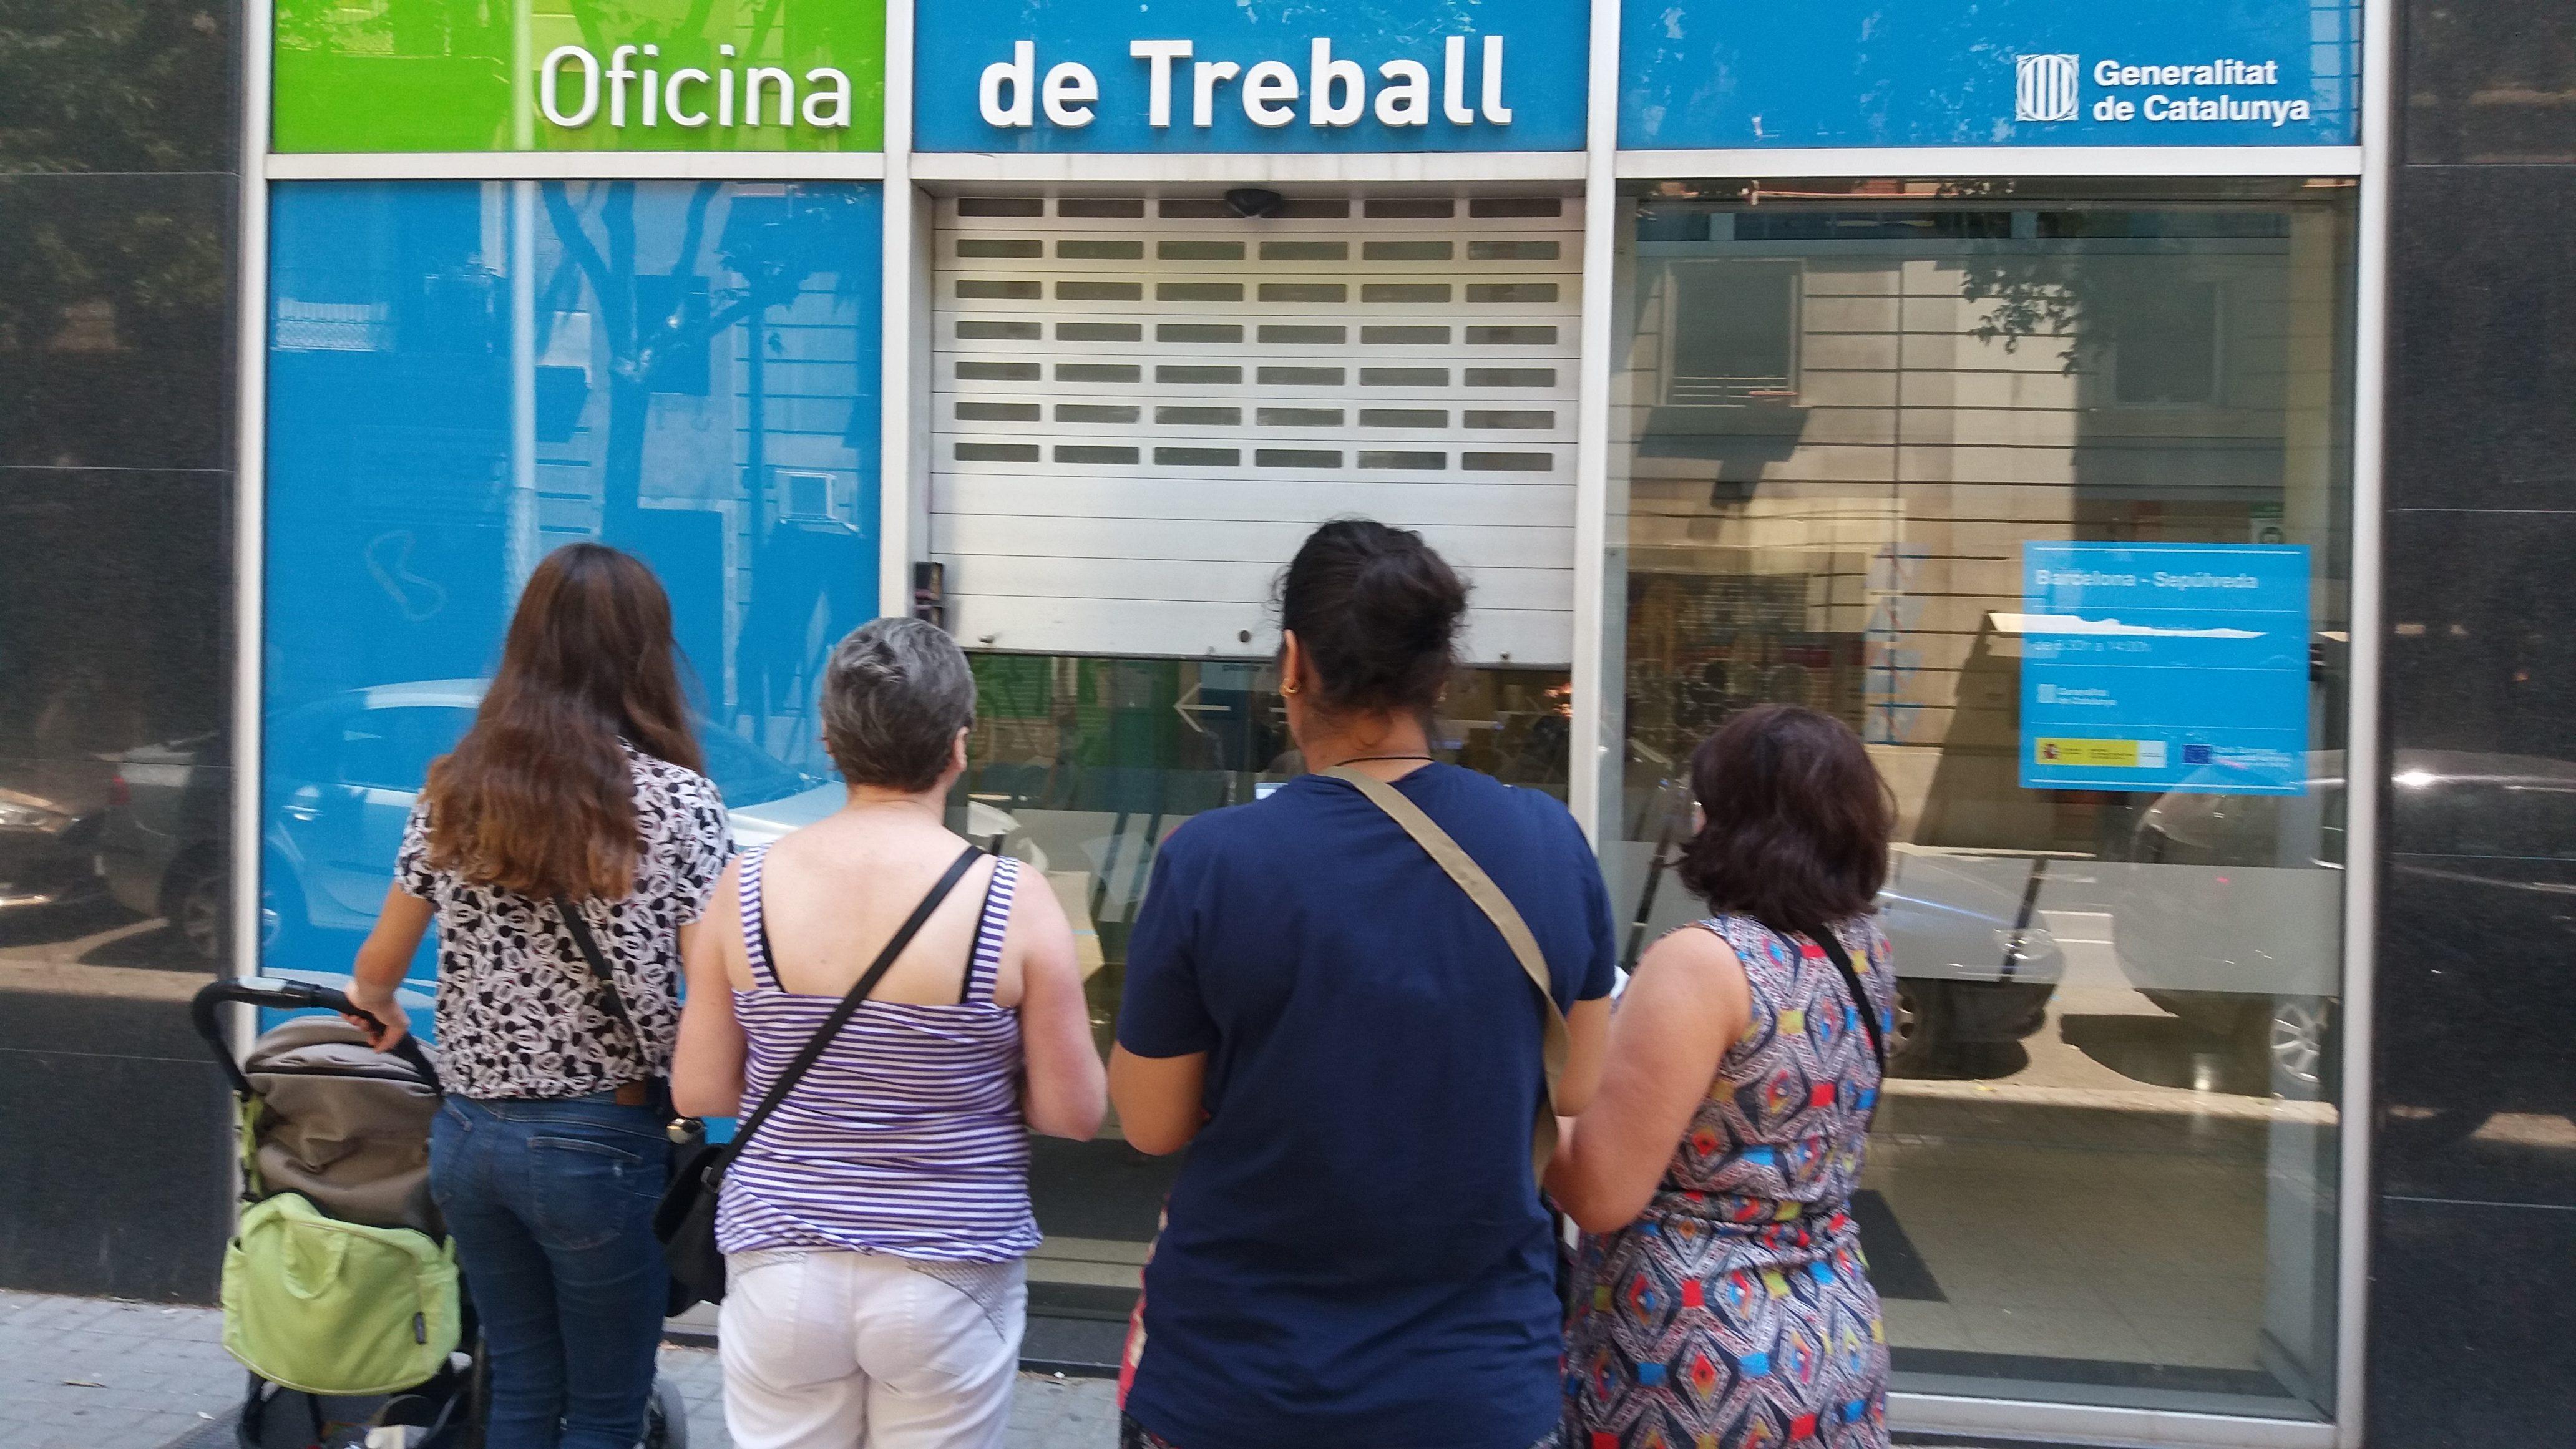 ensenyar socio habitatge-espanyol immigrants refugiats